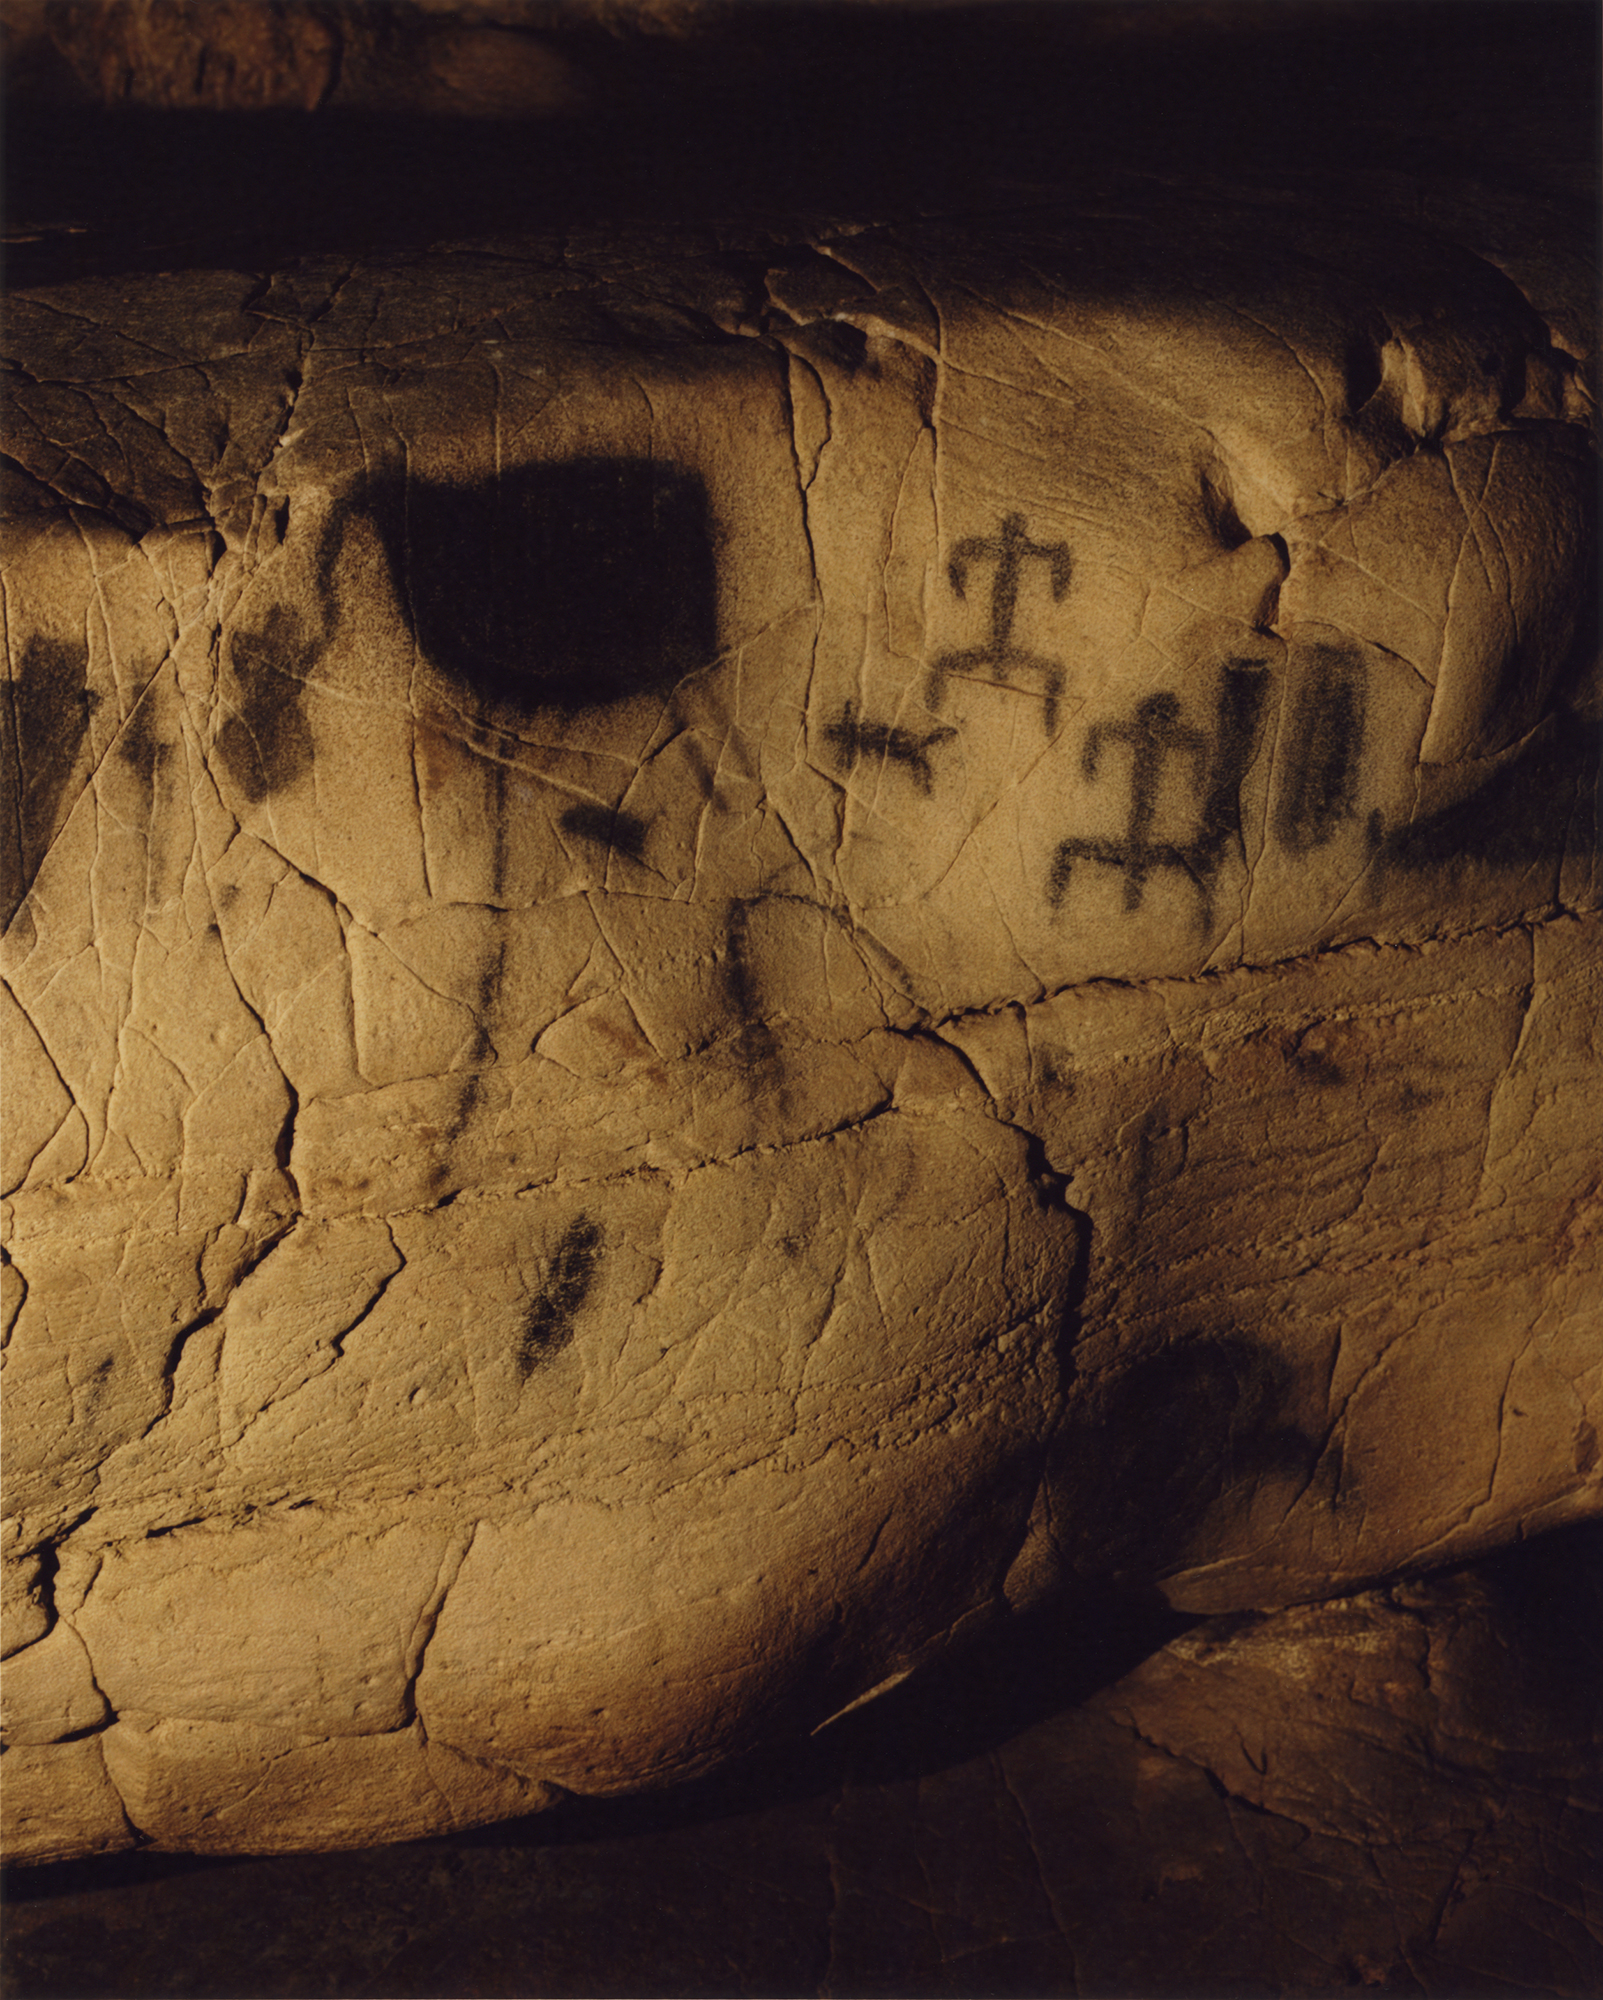 Upper Paleolithic Cave Painting I, 2014